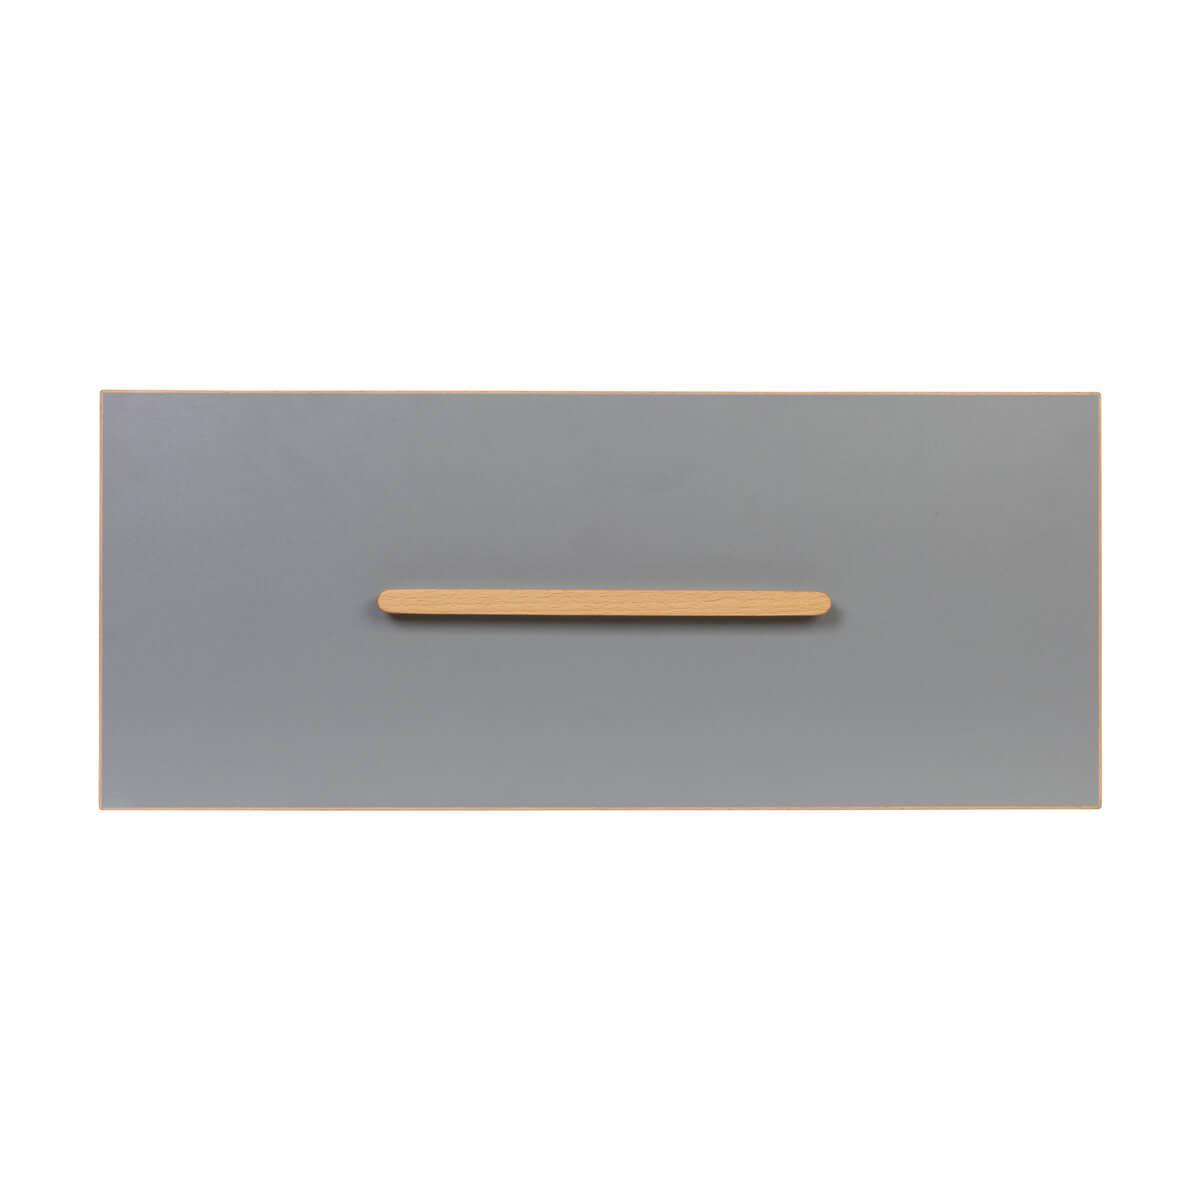 Schubladenblende NADO slate grey